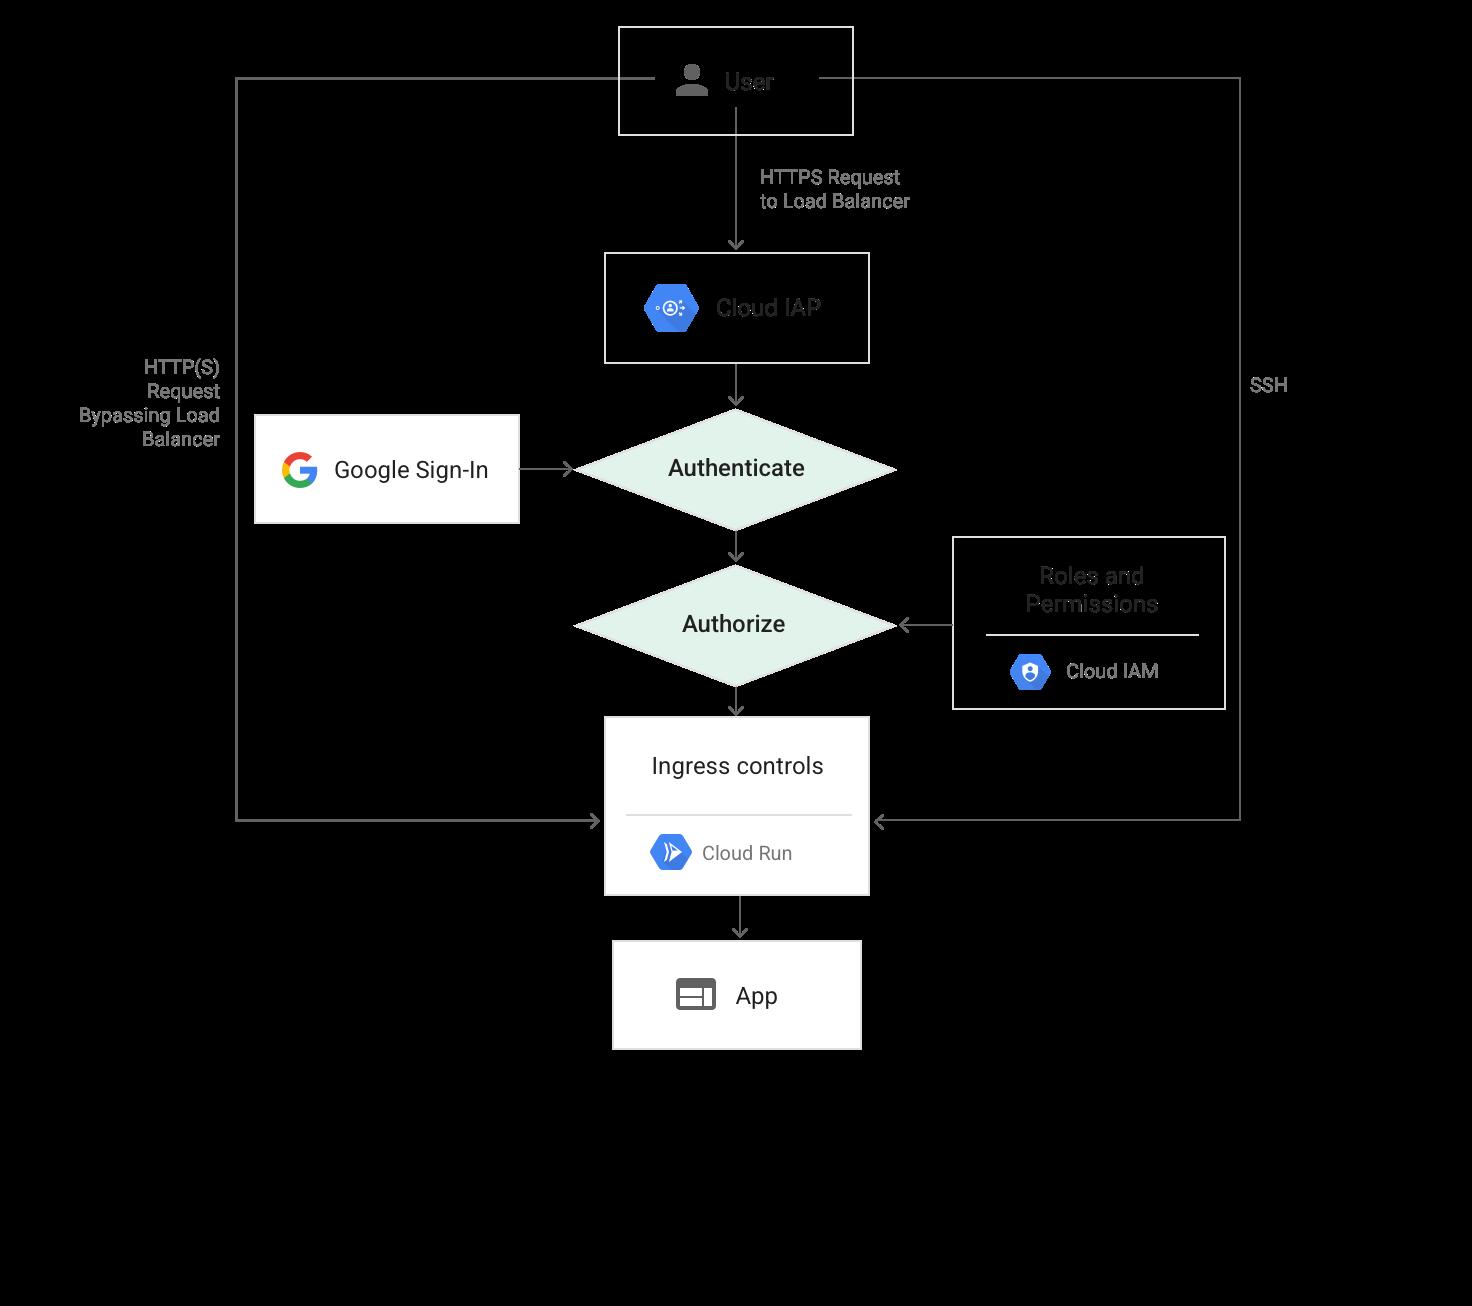 diagram of request path to Cloud Run when using Cloud IAP